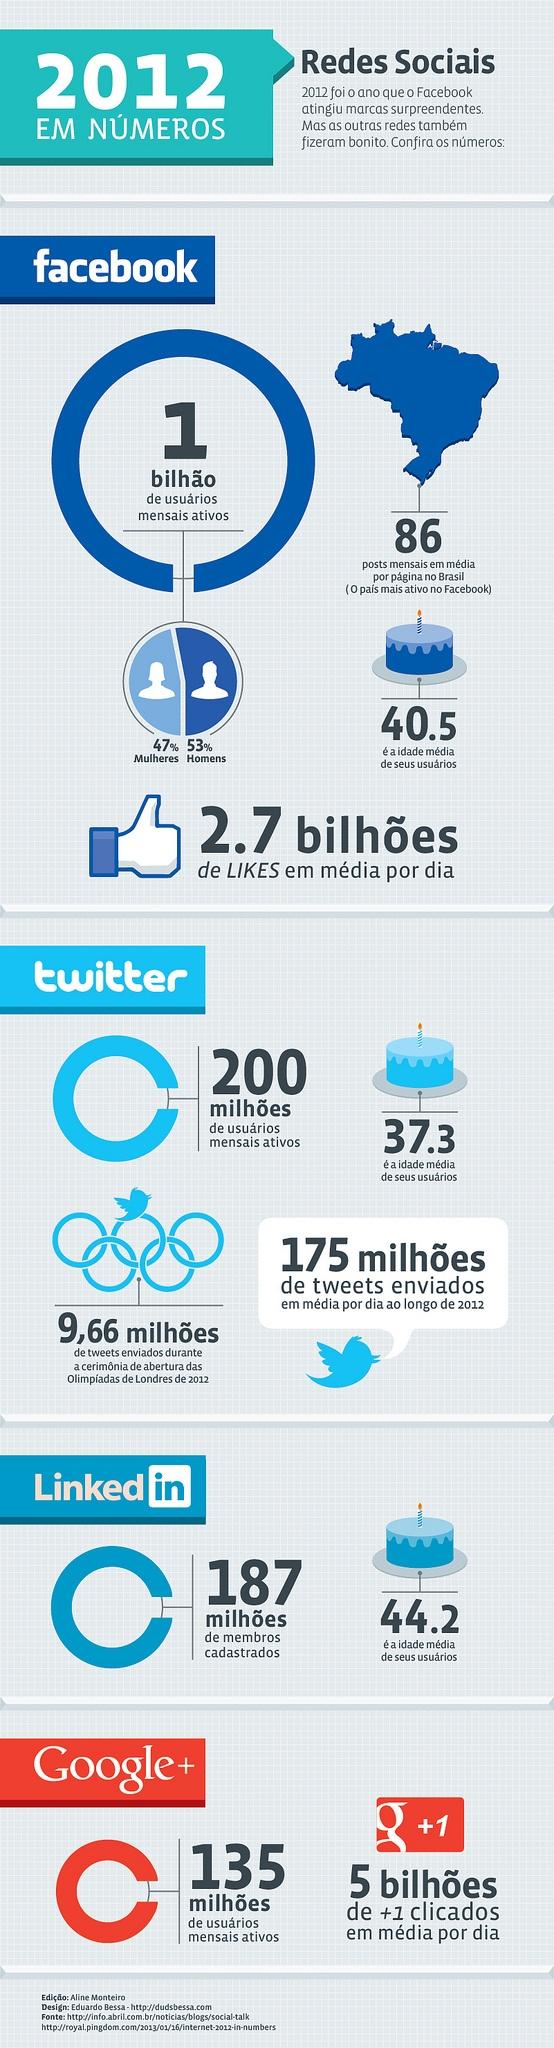 Infográfico Mídias Sociais